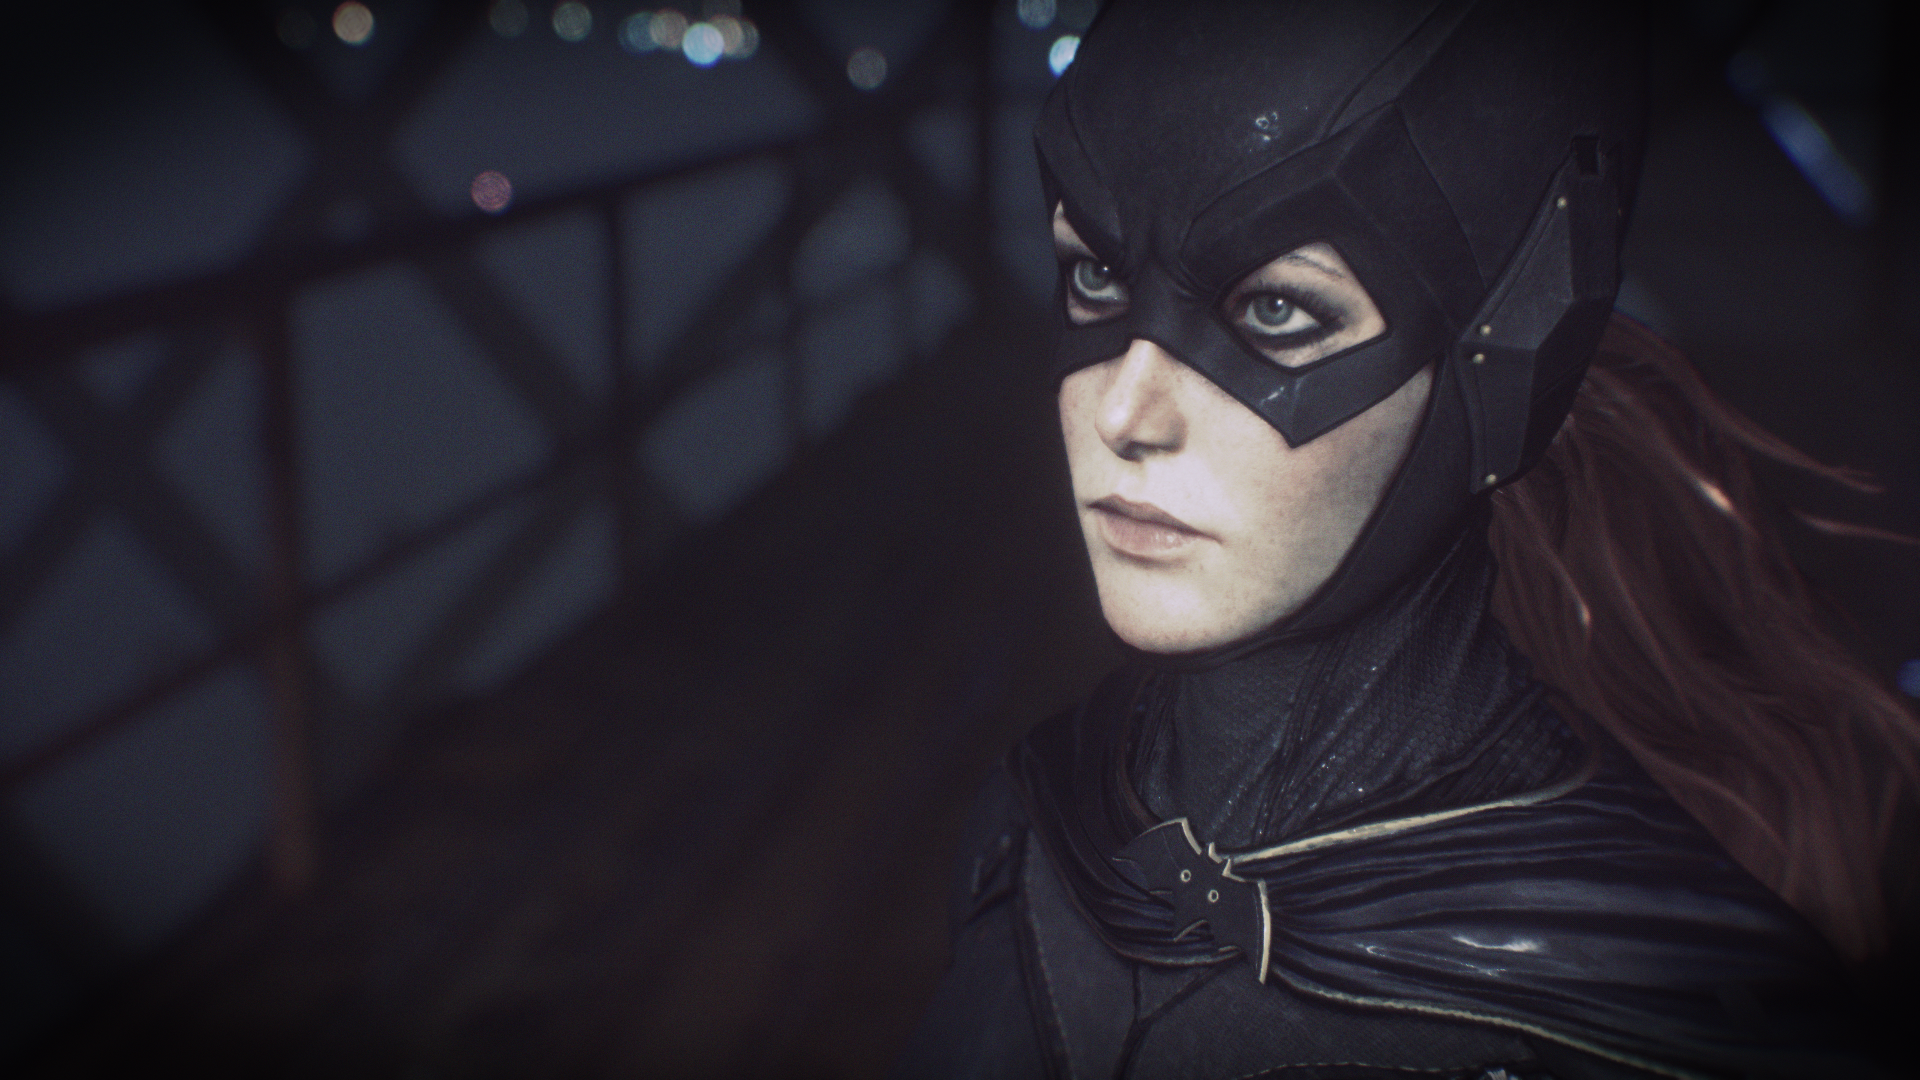 Batman™_ Arkham Knight 22.07.2018 23_53_28.png - Batman: Arkham Knight